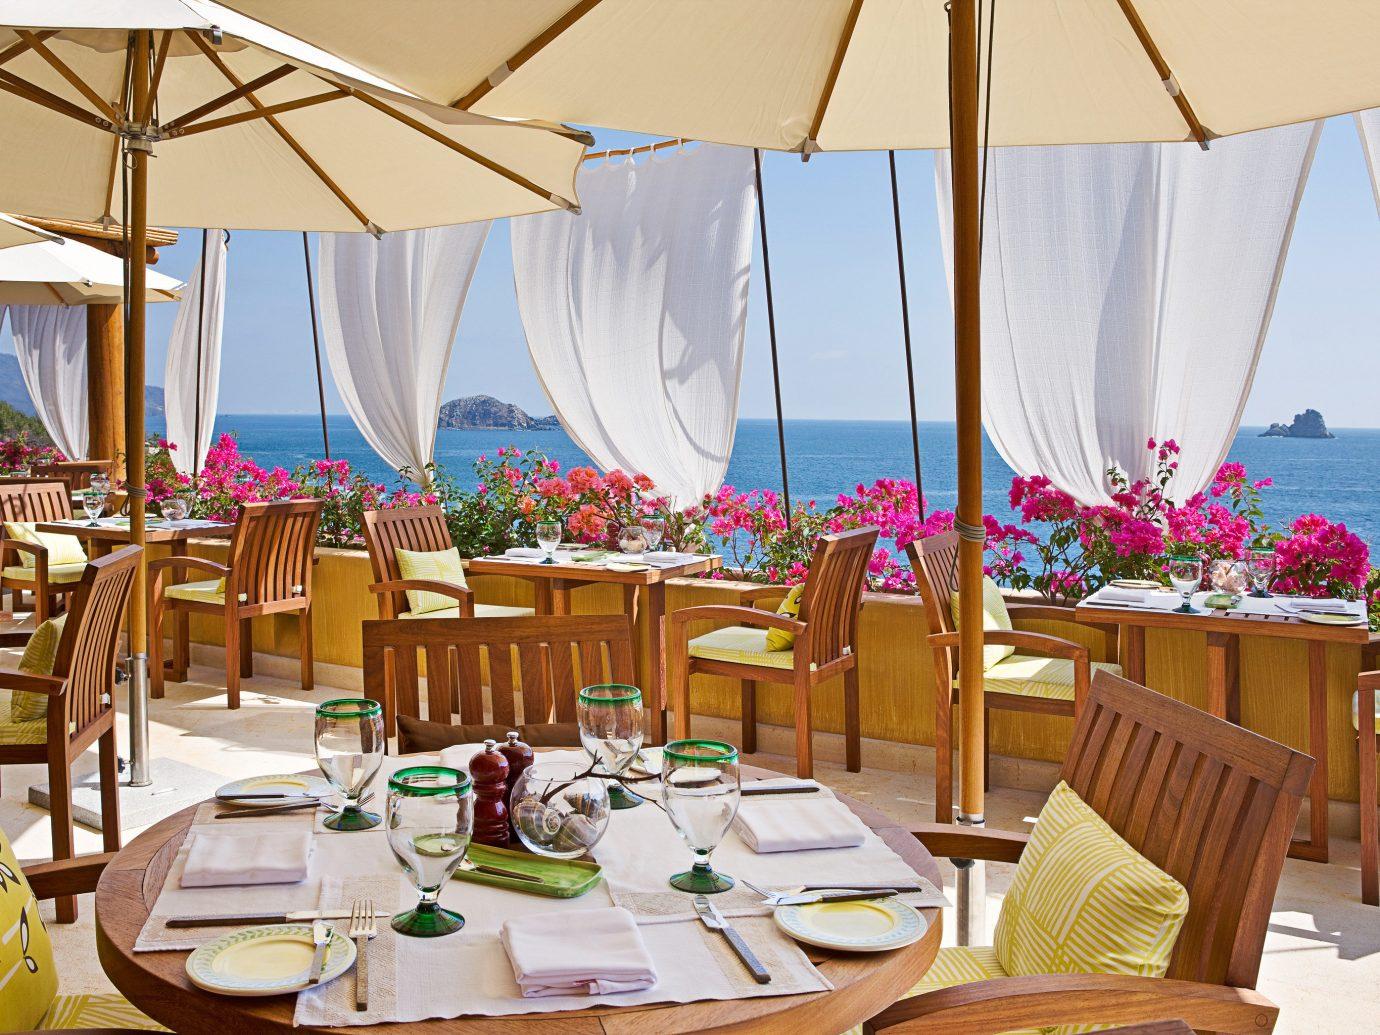 Beach Beachfront Dining Honeymoon Hotels Island Luxury Mexico Romance Romantic Rooftop Tulum table chair meal restaurant wedding Resort function hall set decorated furniture